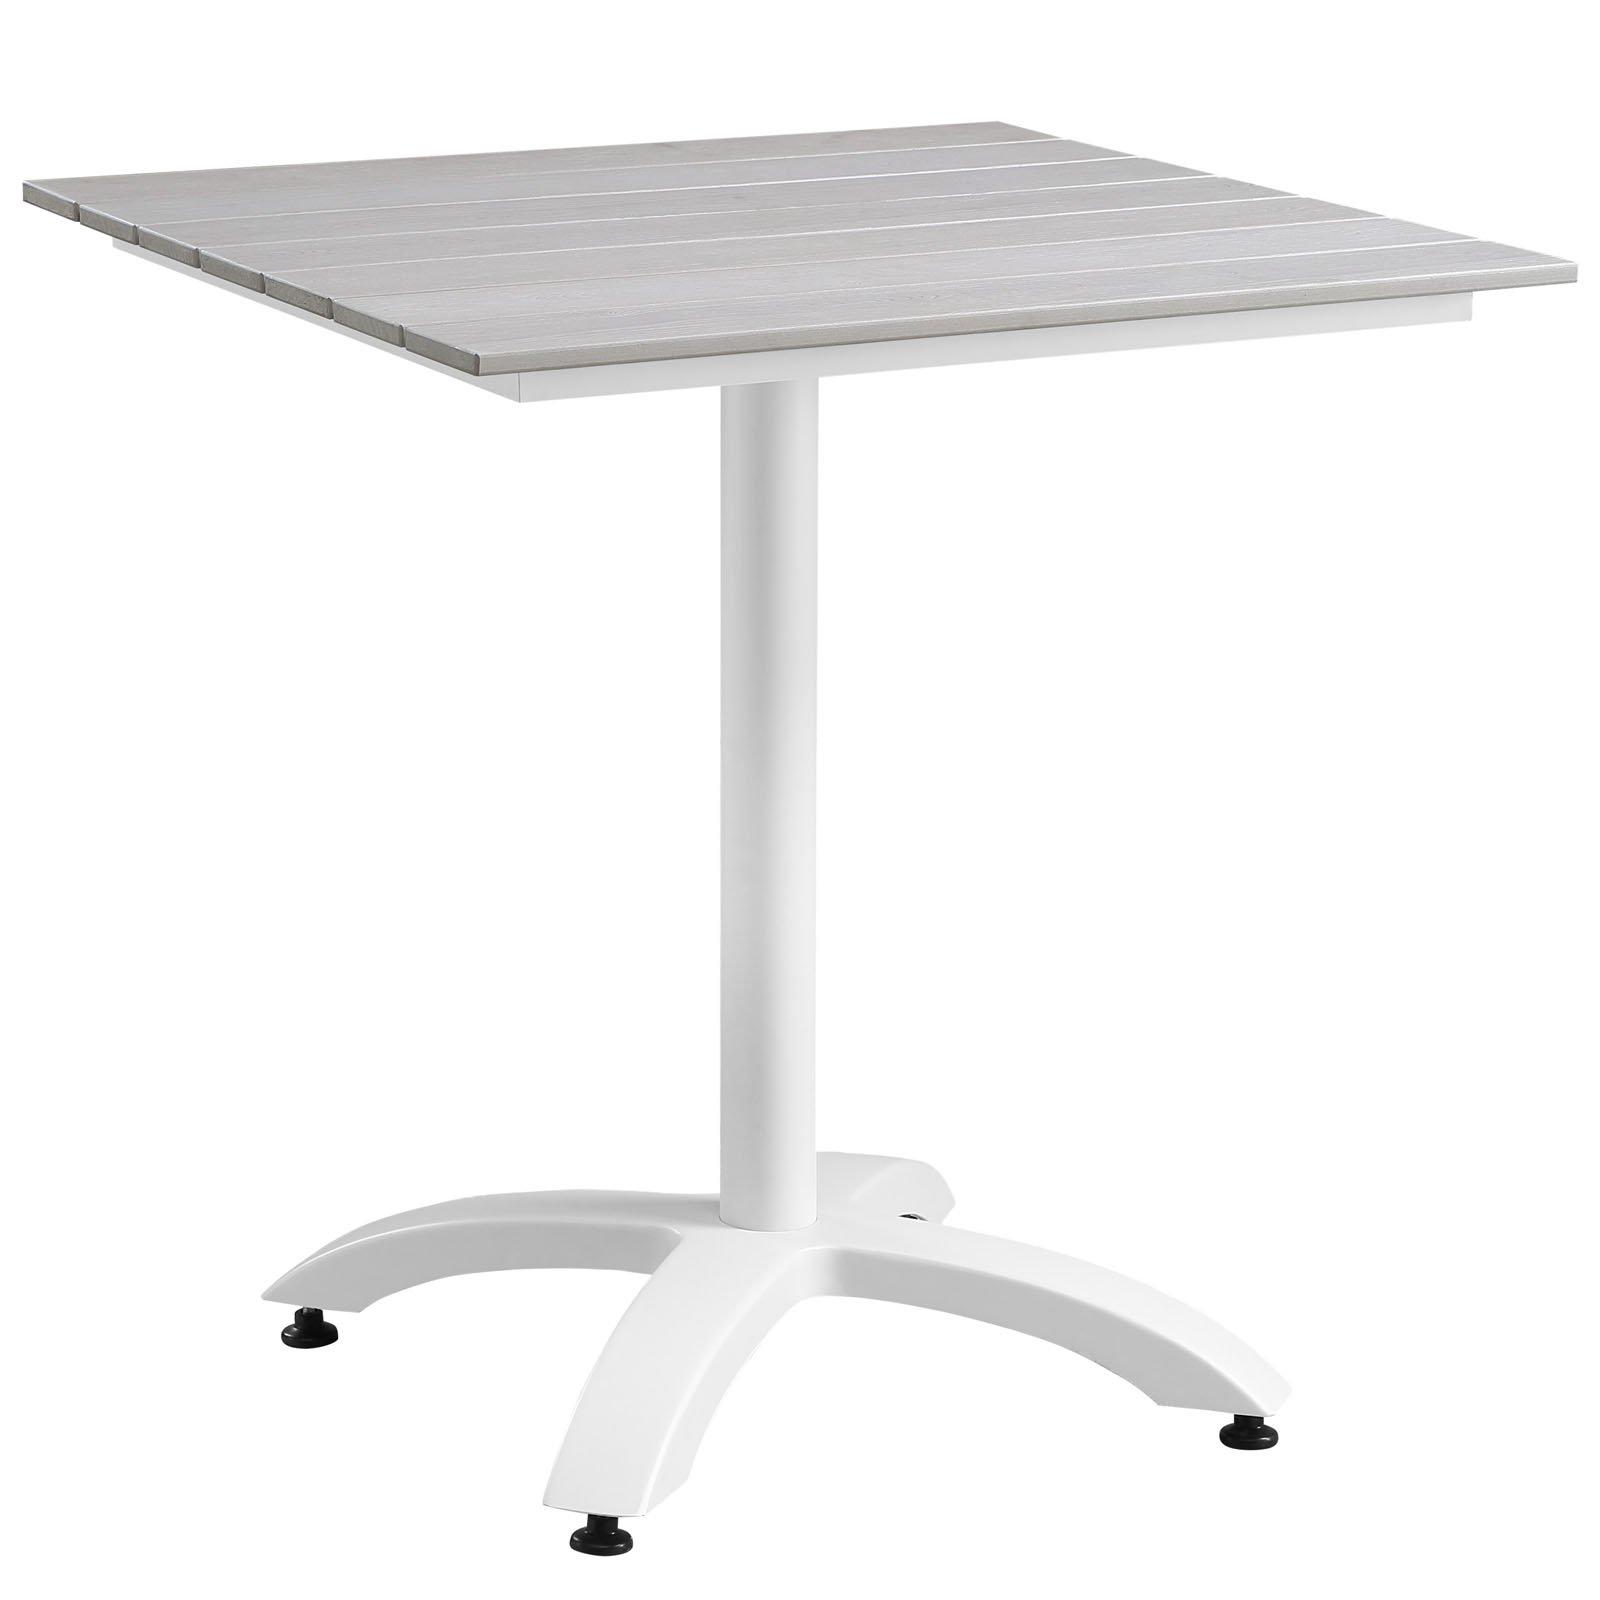 Plutus Brands MF1848 Outdoor Patio Dining Table, 28'', White Light Gray